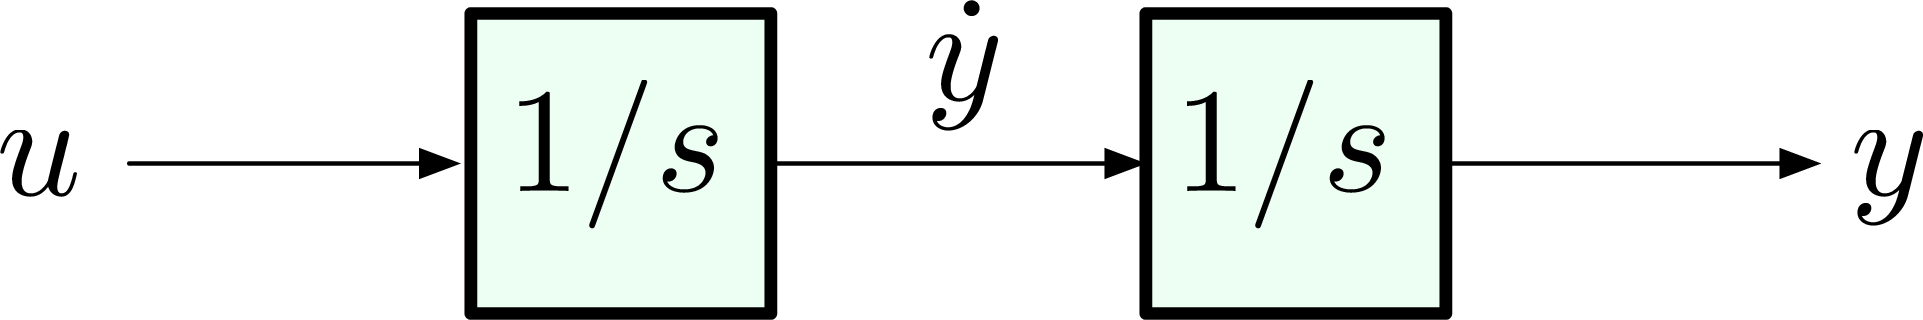 Ece 486 Control Systems